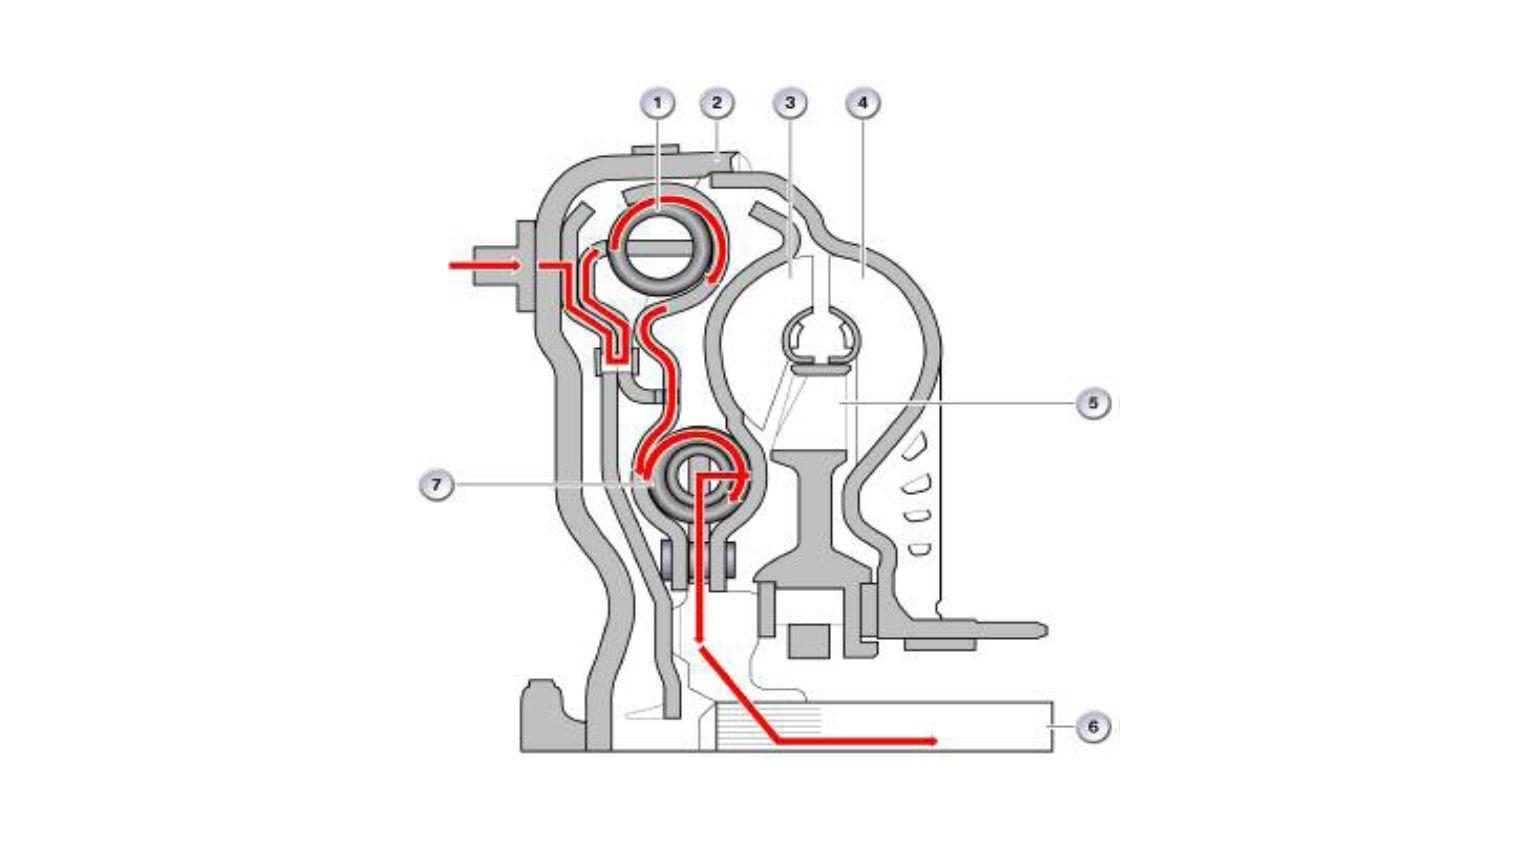 hight resolution of edenpure heater wiring schematic edenpure heater parts auto www edenpure eden pure 1000xl wiring diagram